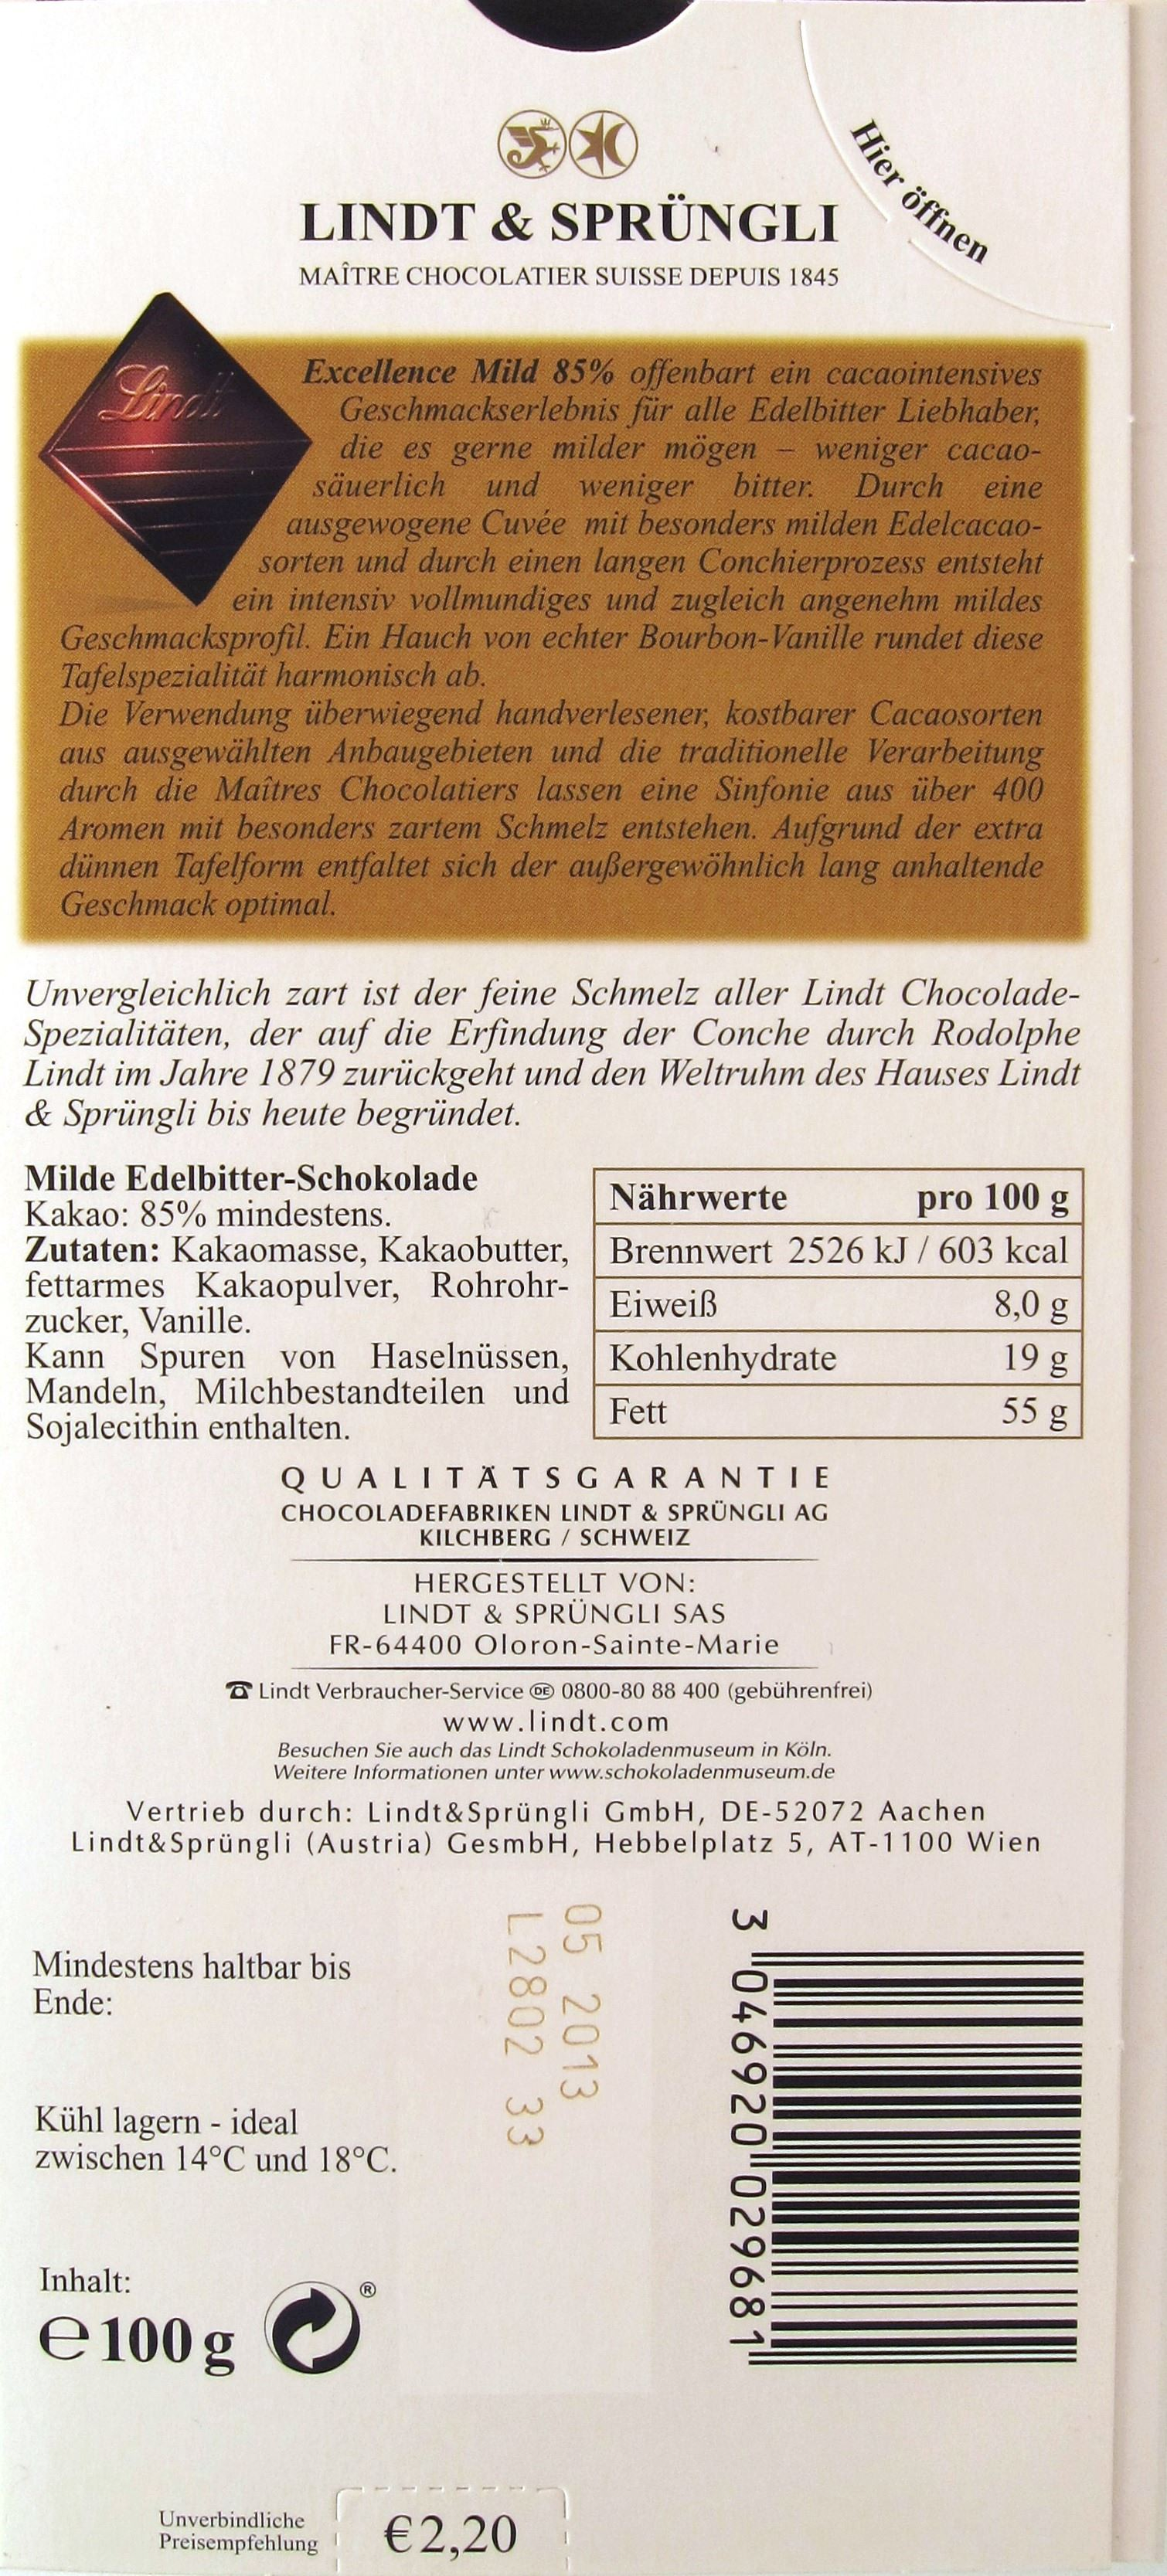 Lindt Bitterschokolade 85%, mild (Packungsrückseite)